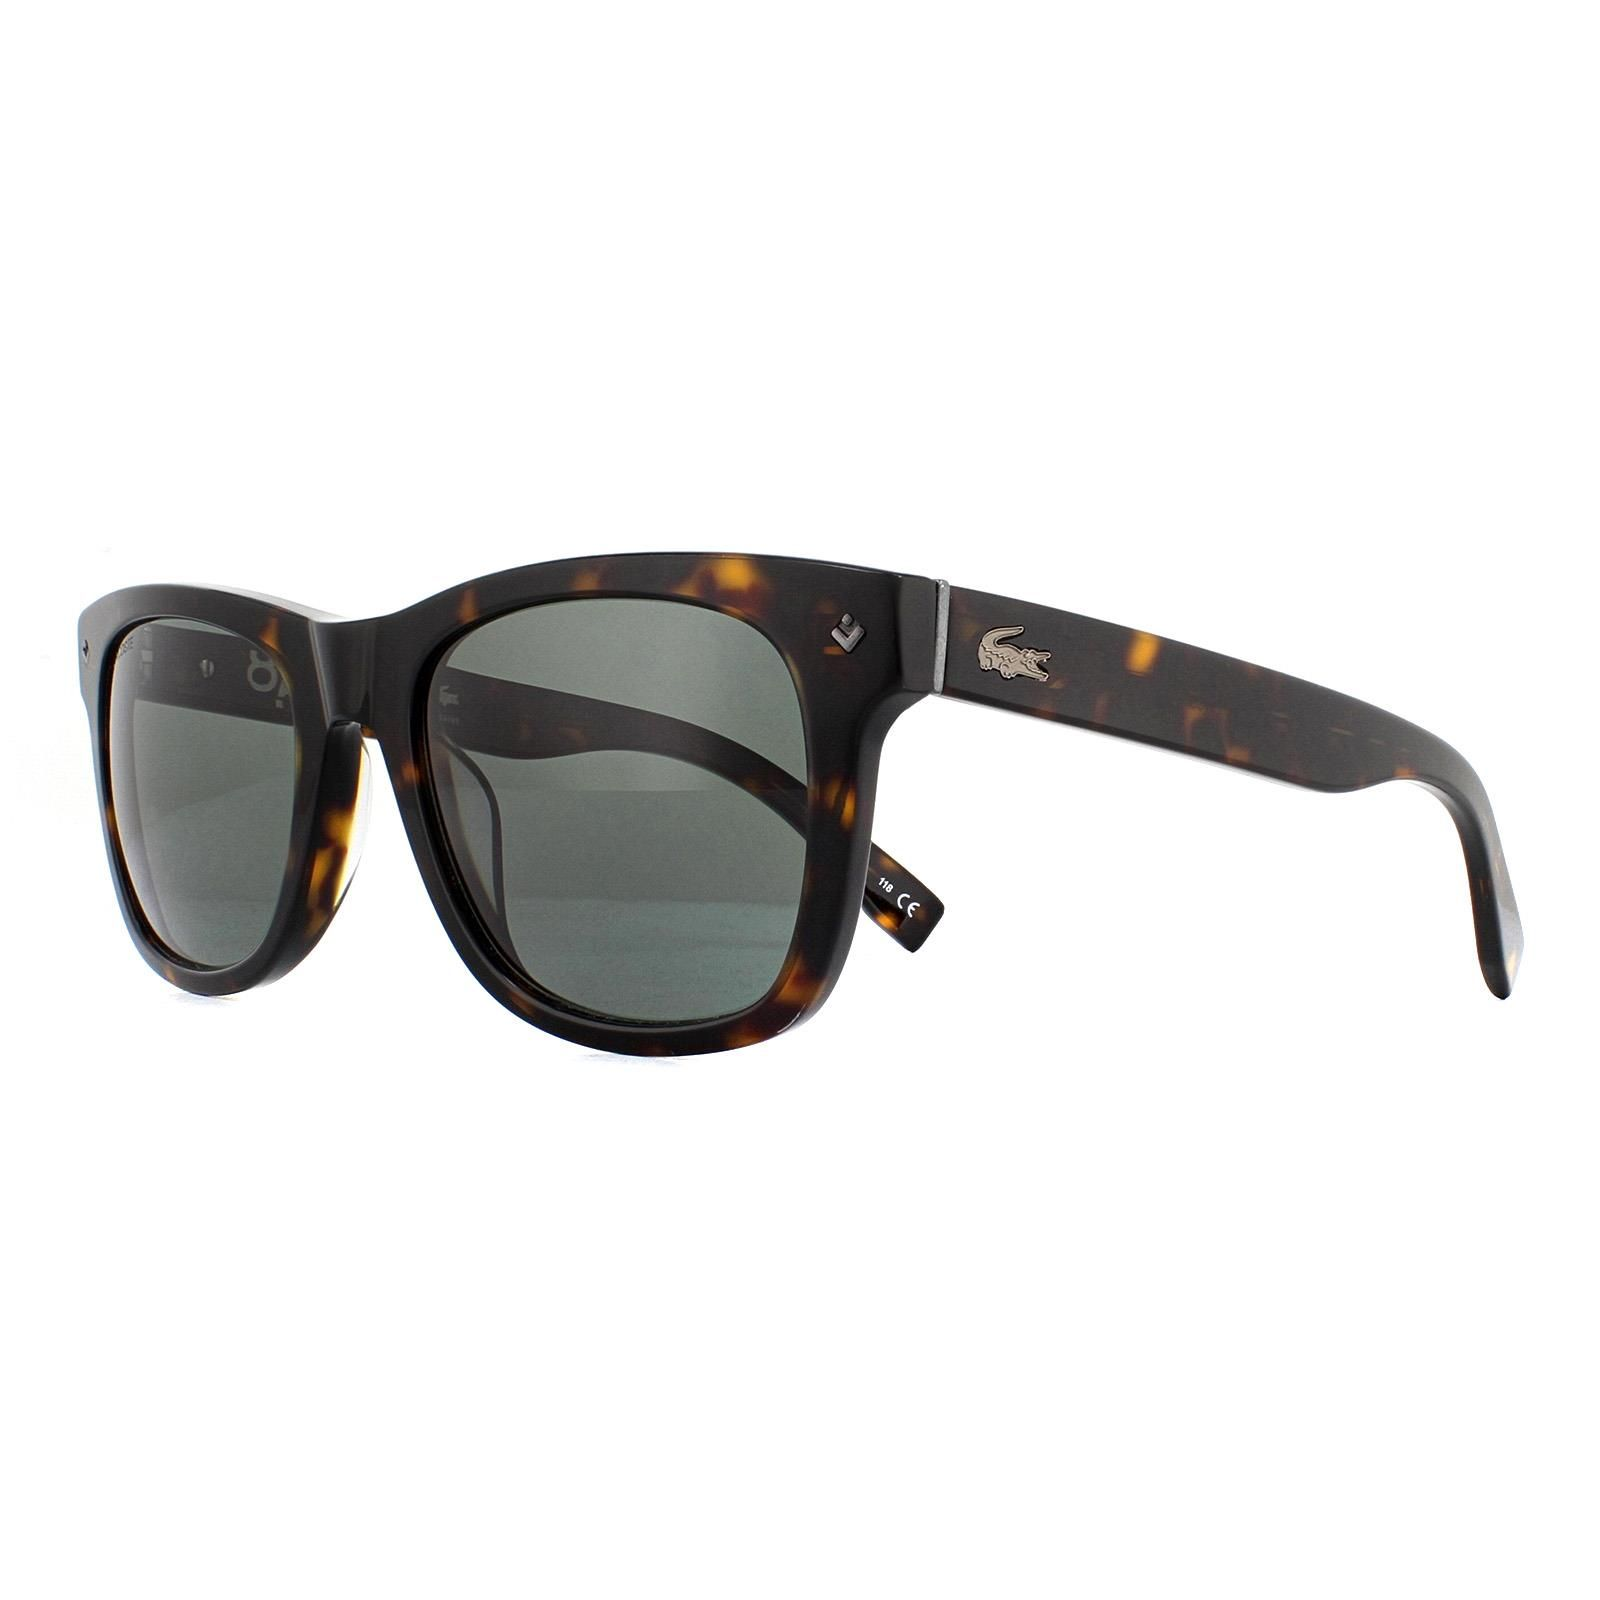 Lacoste Sunglasses L878S 214 Dark Havana Grey